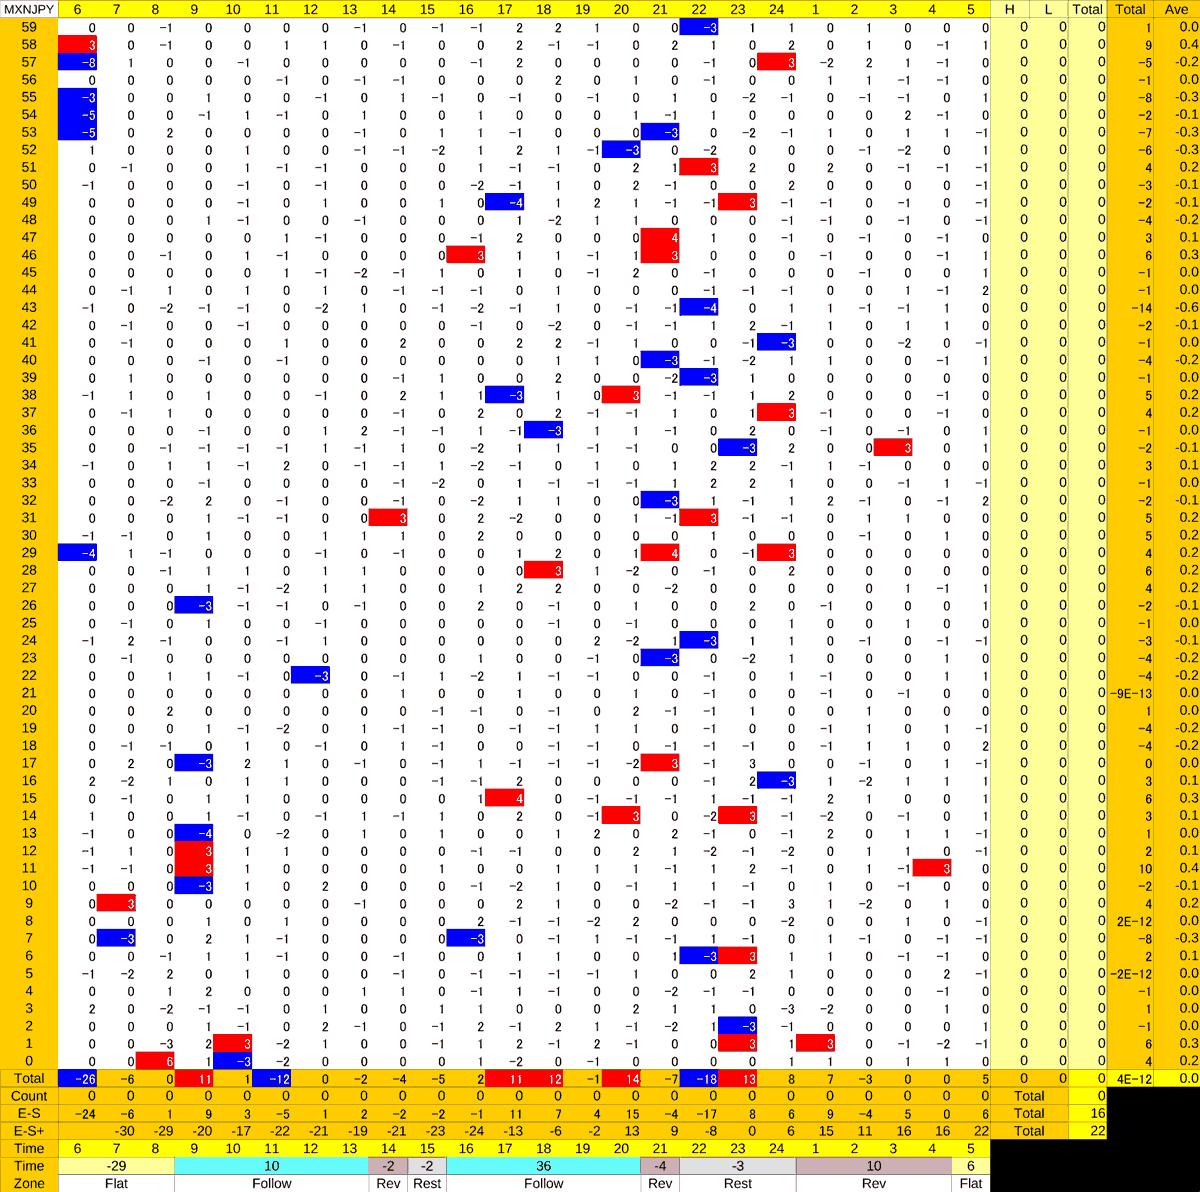 20201120_HS(3)MXNJPY